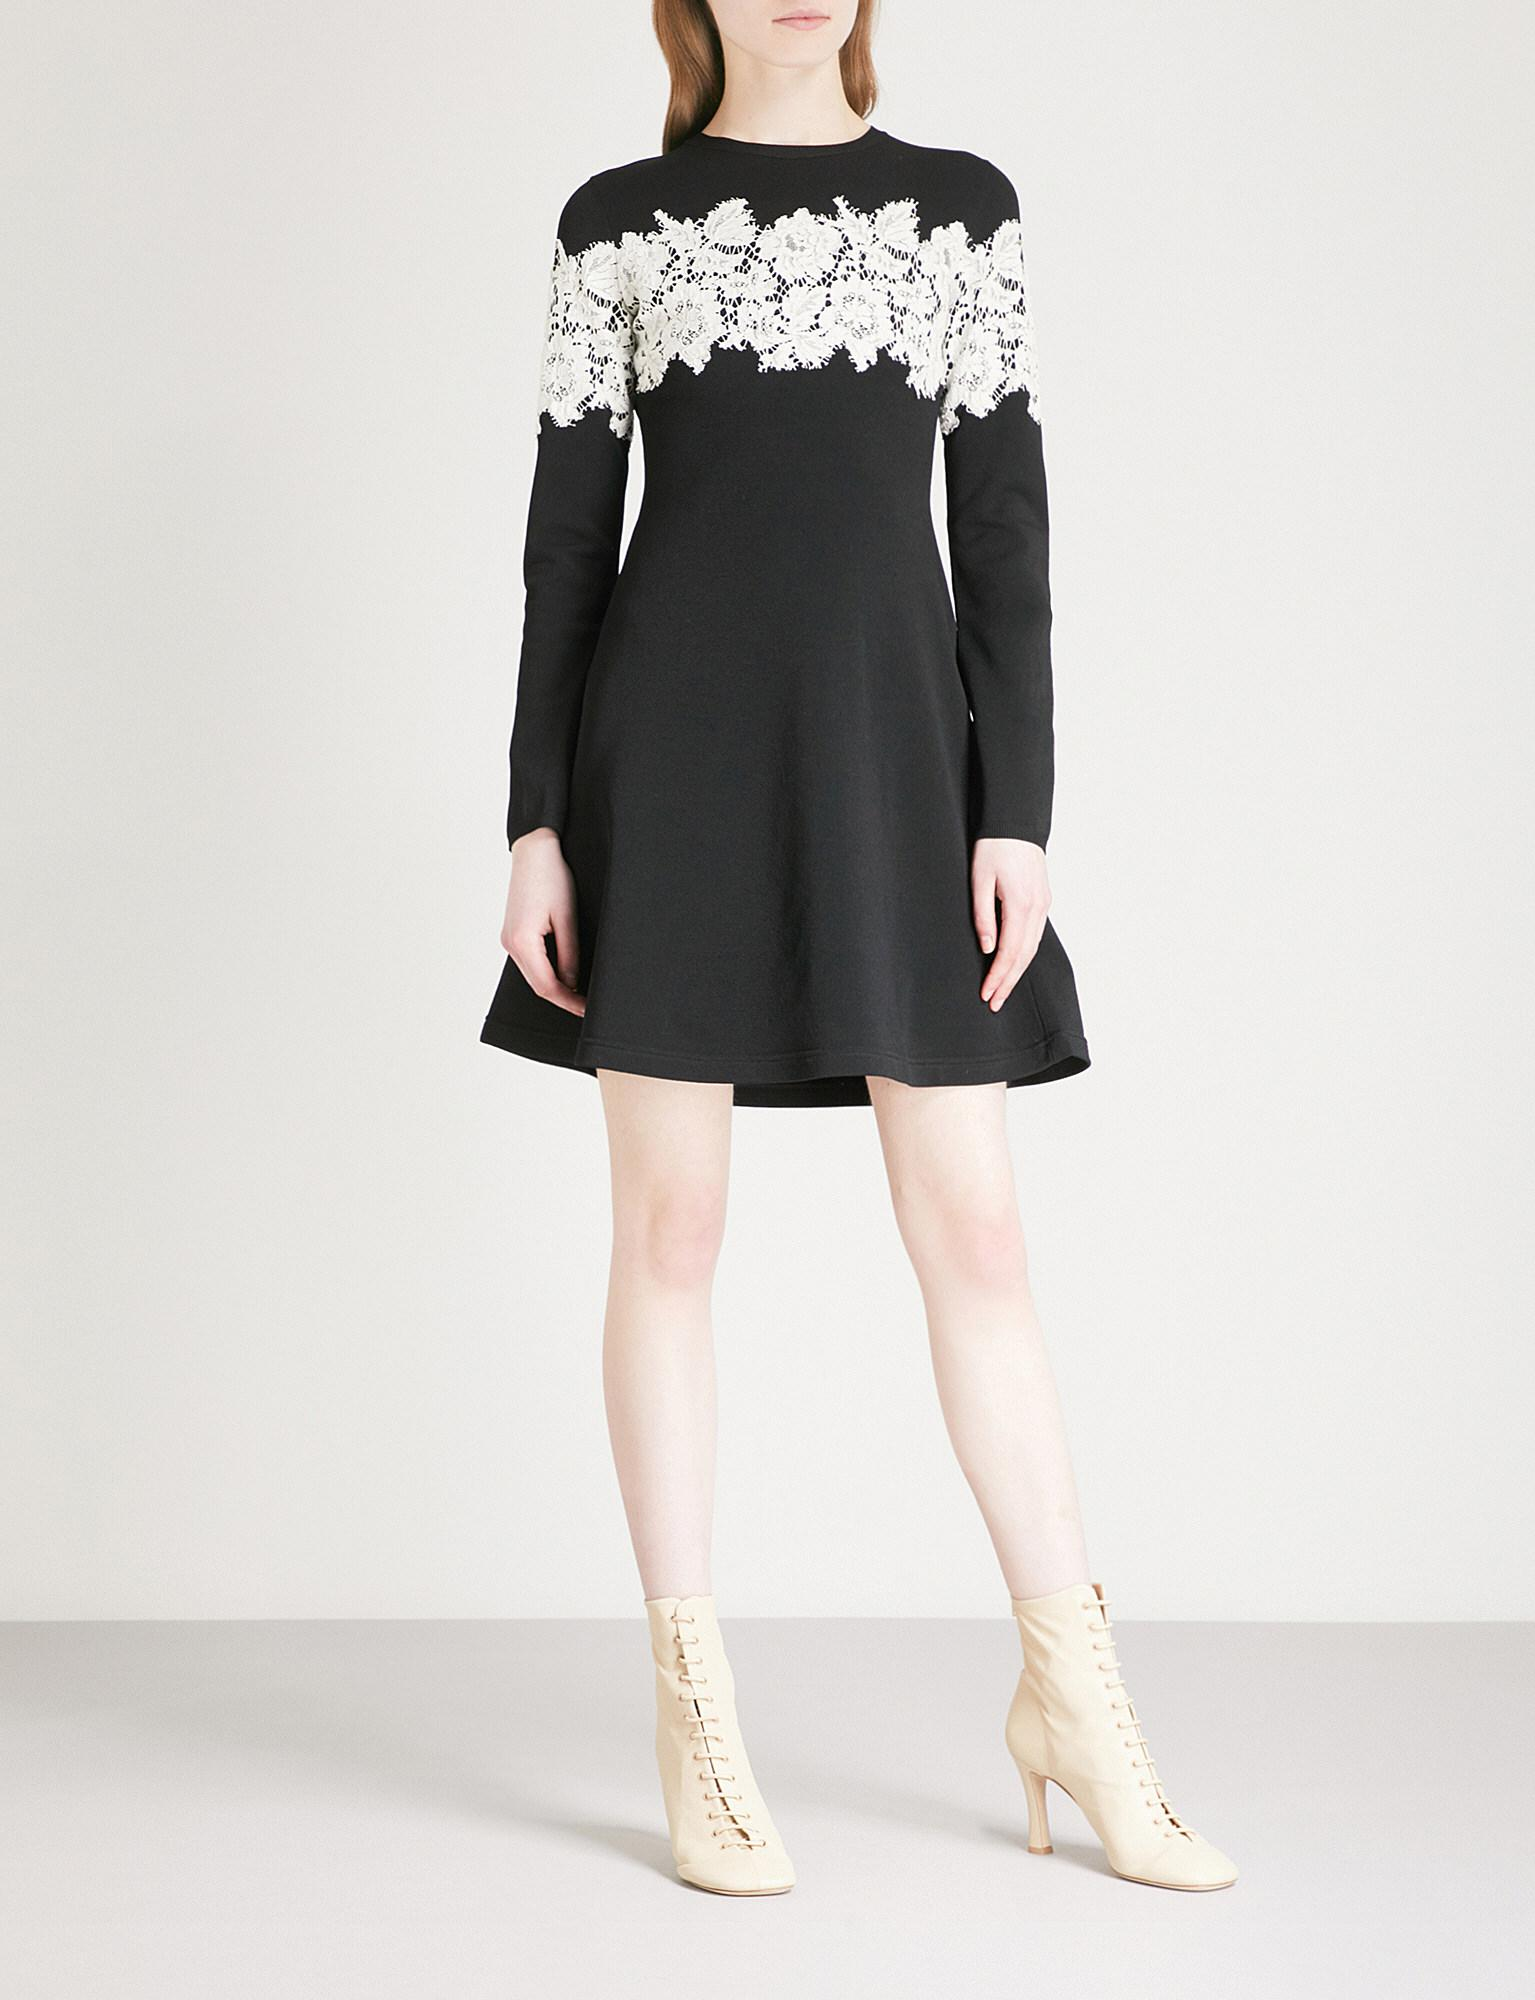 Discount Supply Valentino Lace-Embroidered Stretch Mini Dress Marketable Cheap Price JV140